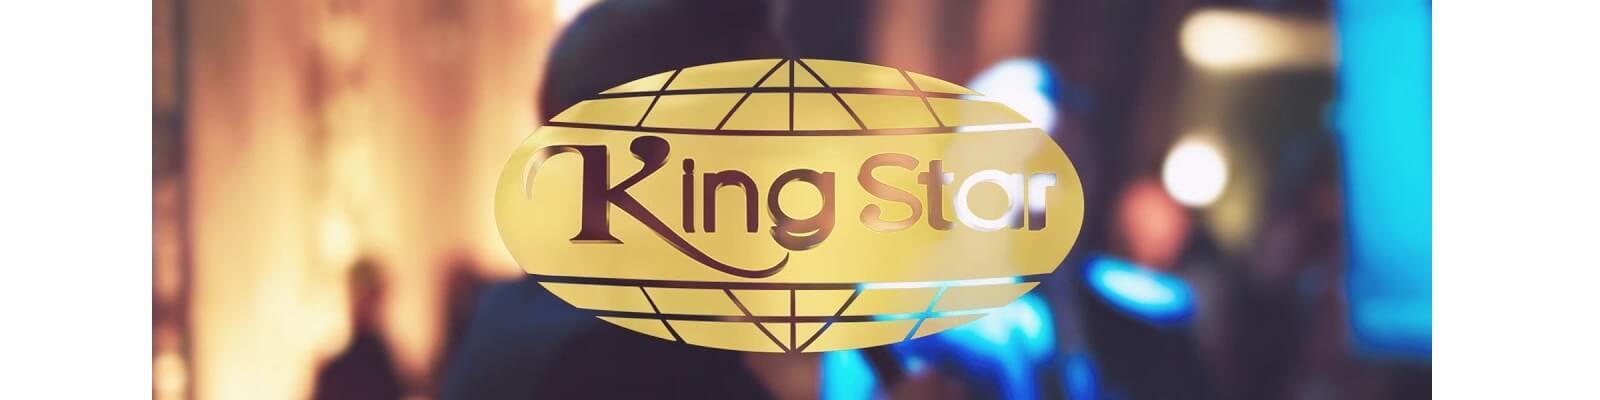 "King Star Colchões é confiável? Descubra!<span class=""wtr-time-wrap after-title""><span class=""wtr-time-number"">6</span> minutos de leitura</span>"